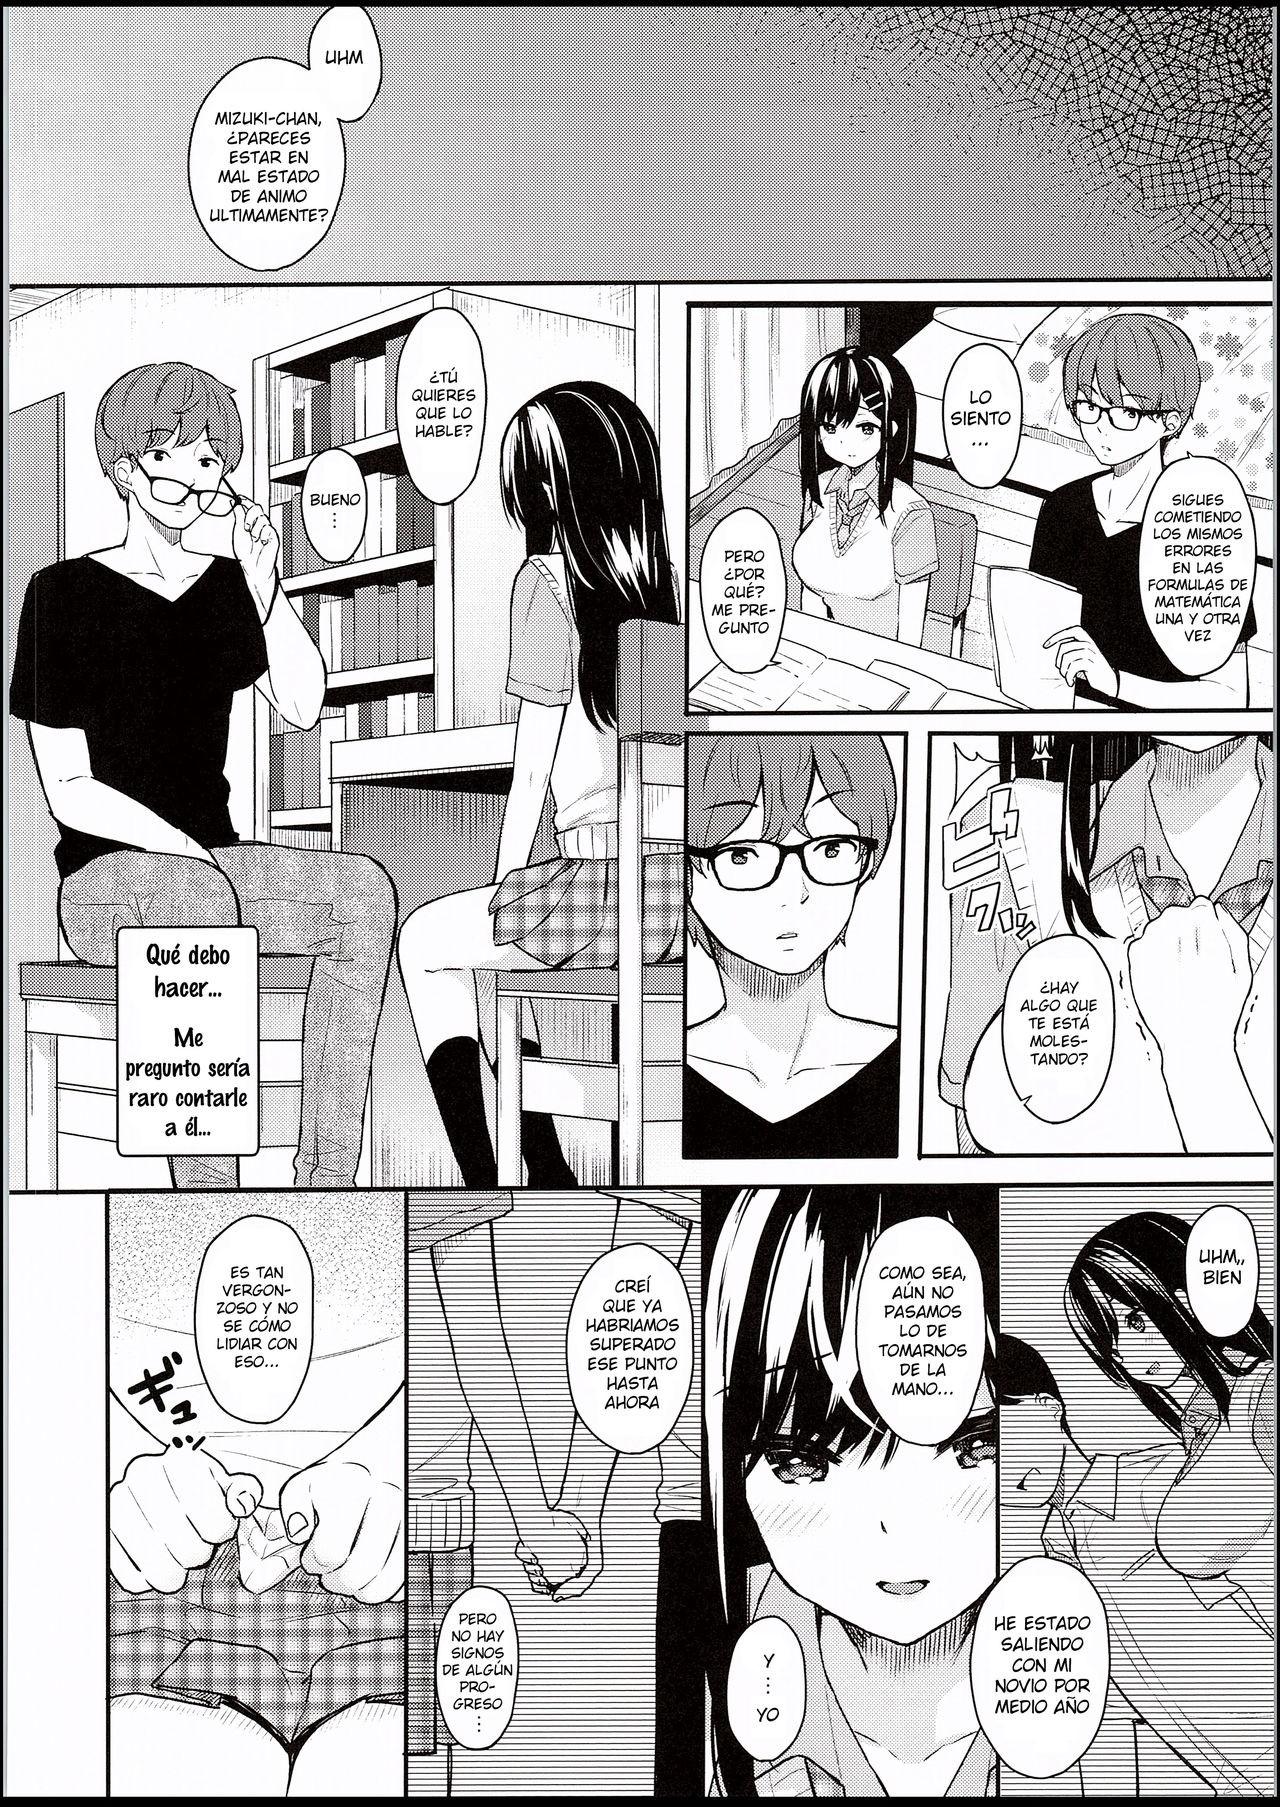 Itomusubi: Chapter 1 - Page 5